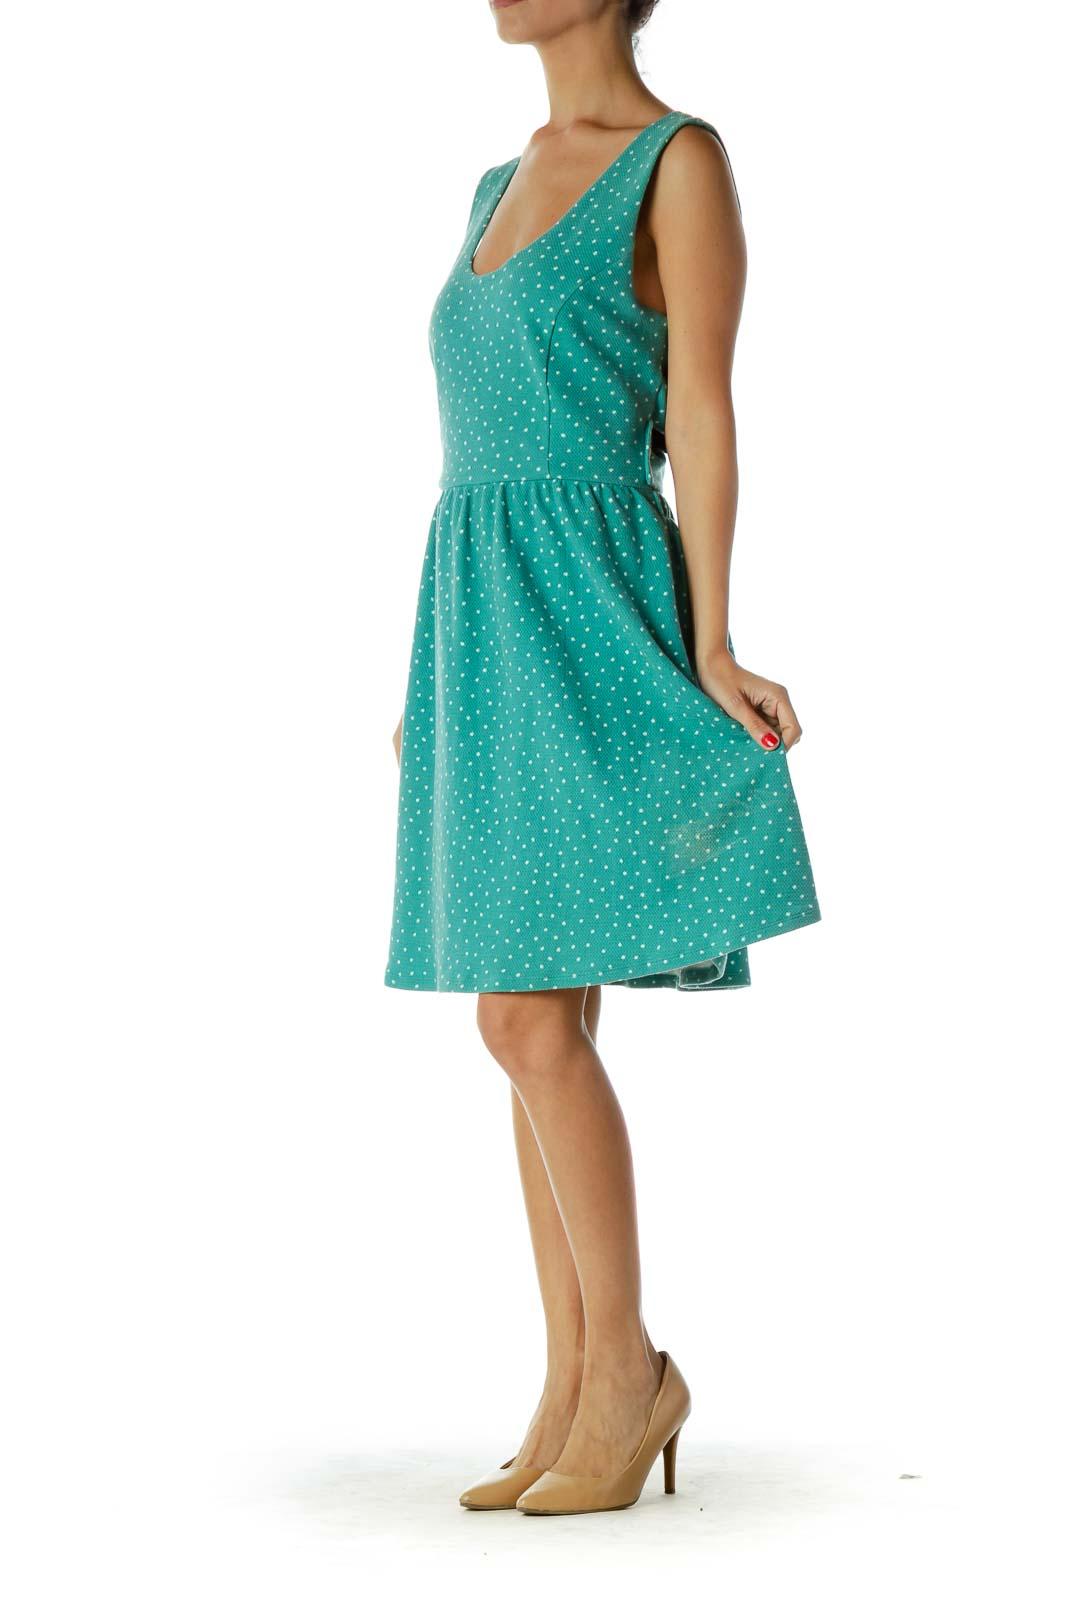 Green White Polka-Dot Day Dress